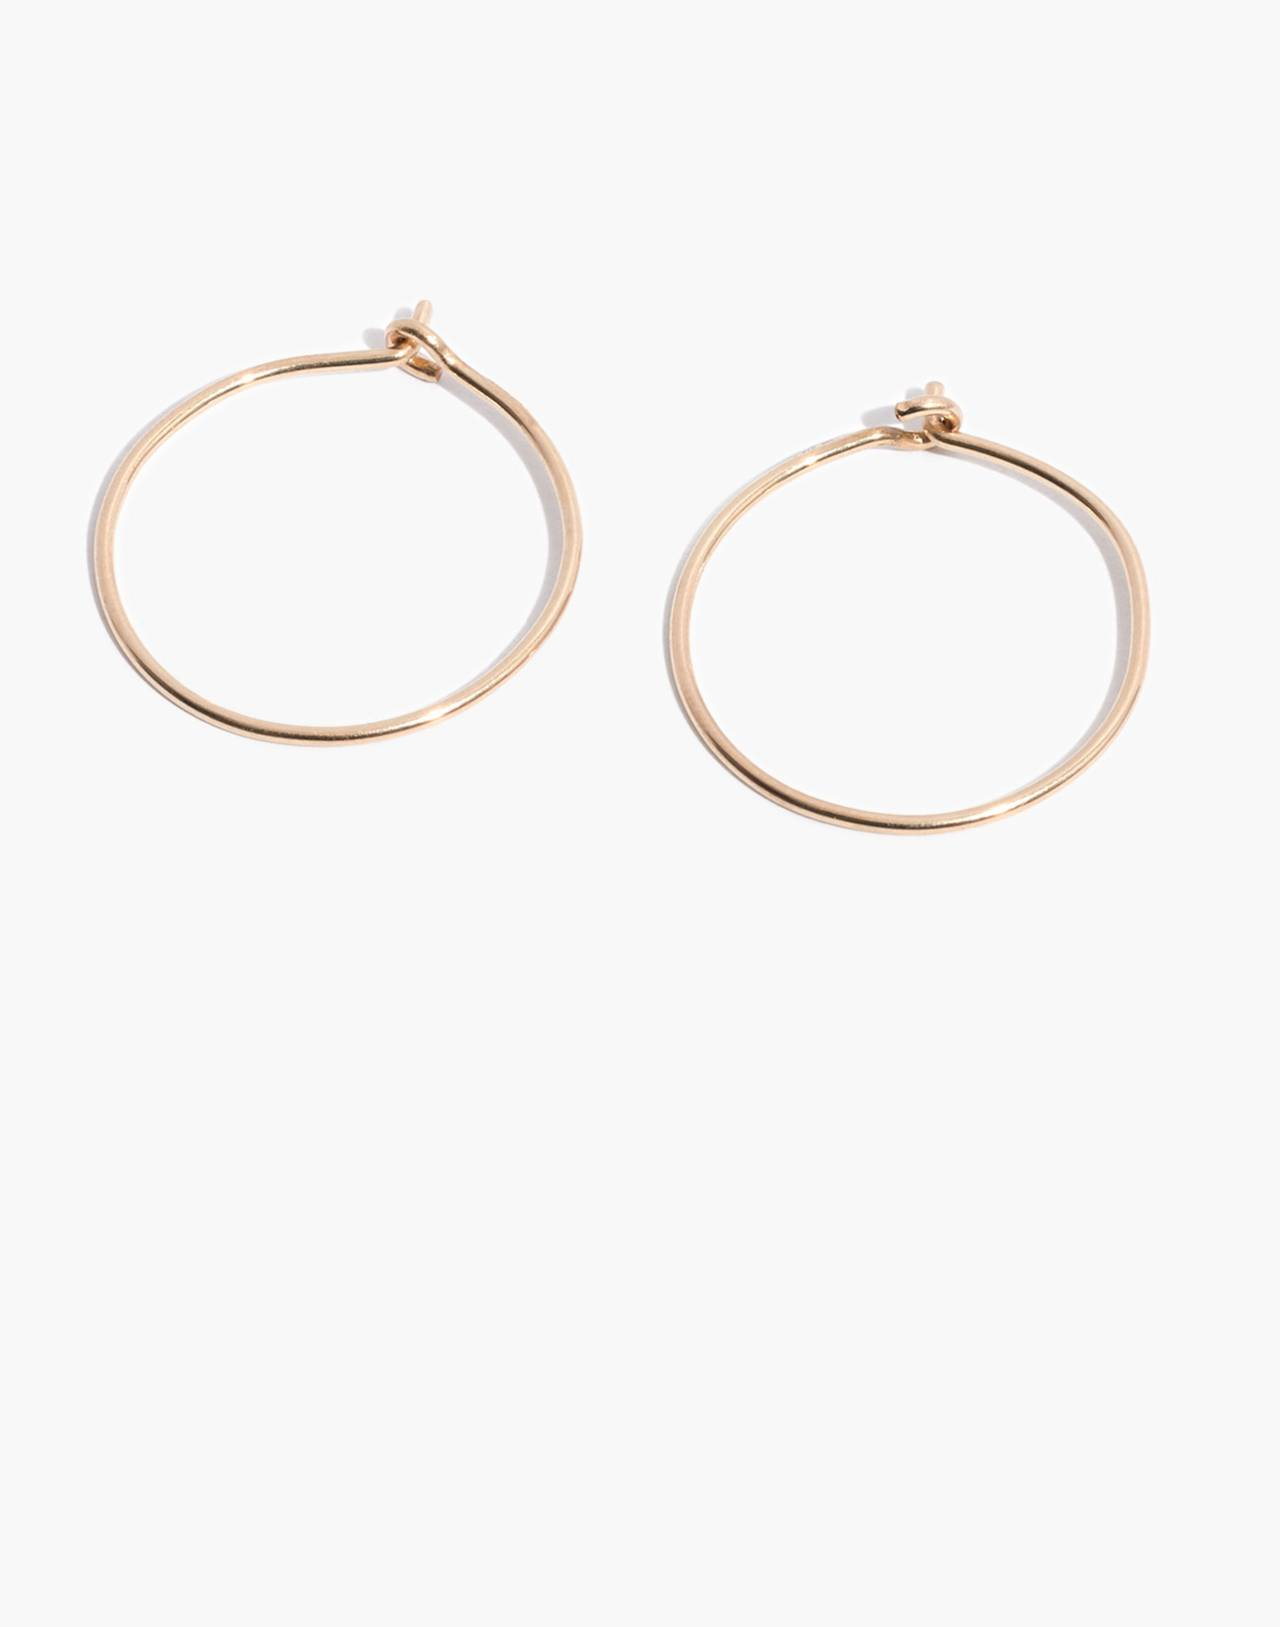 14k Gold-Filled Hoop Earrings in 14k gold fill image 1